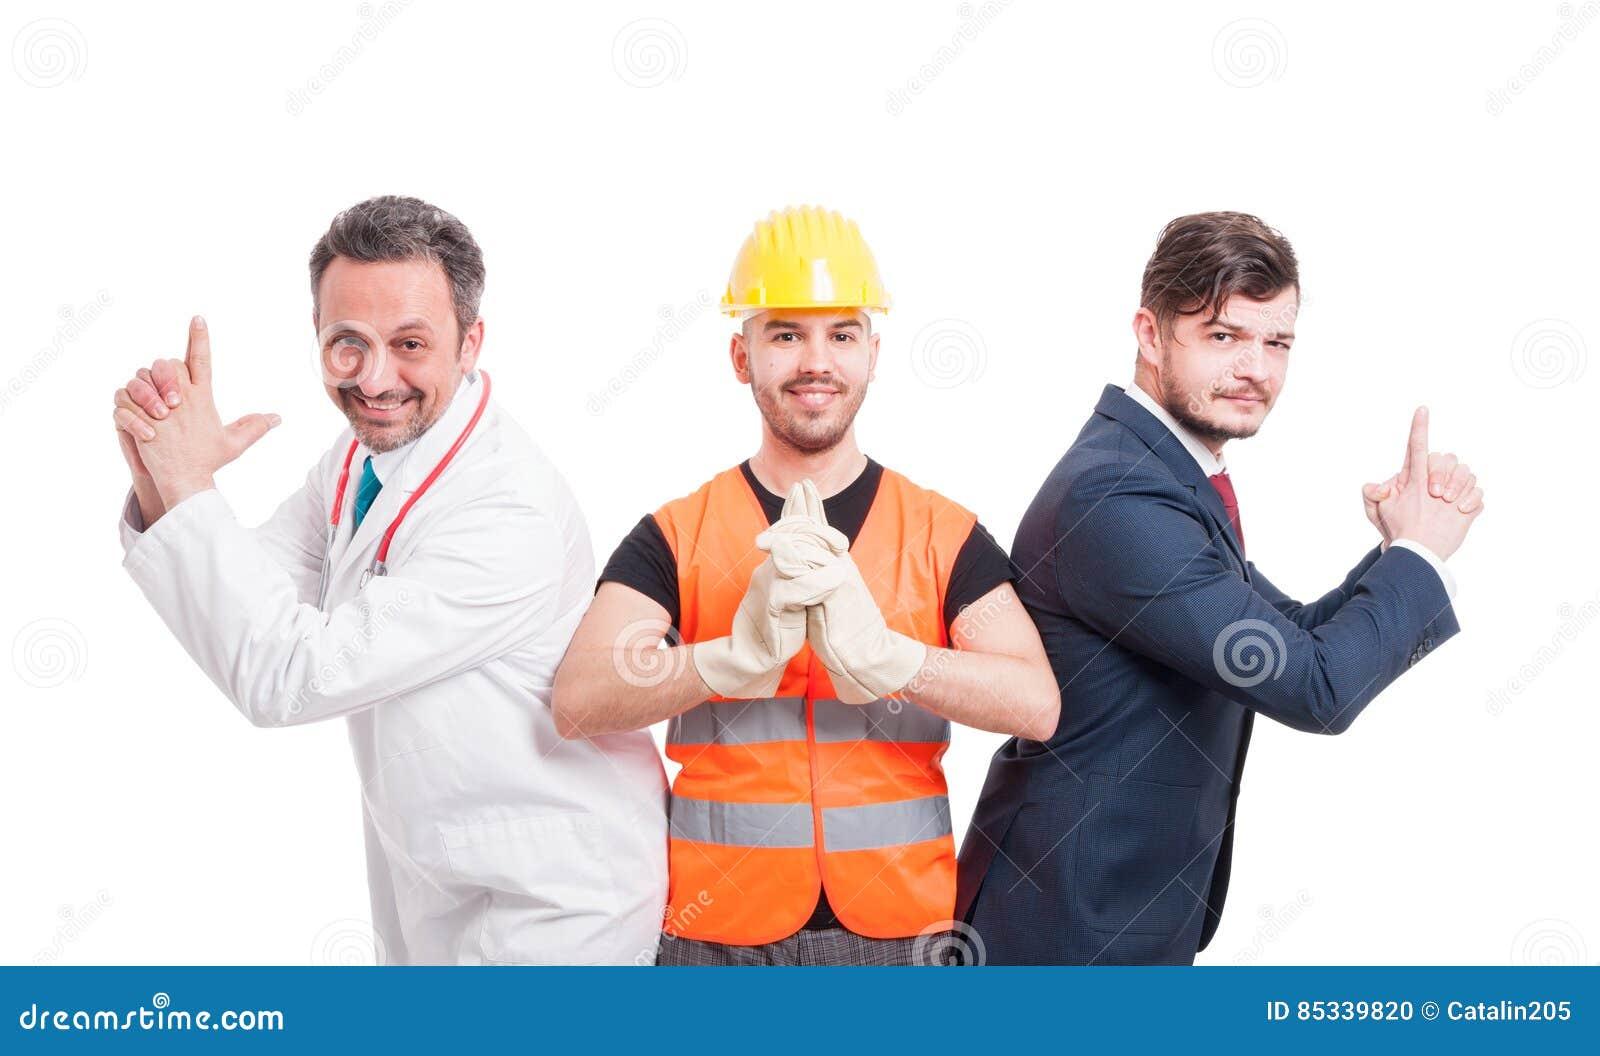 https://thumbs.dreamstime.com/z/three-men-different-professions-handsome-doing-shoot-gun-gesture-white-background-85339820.jpg